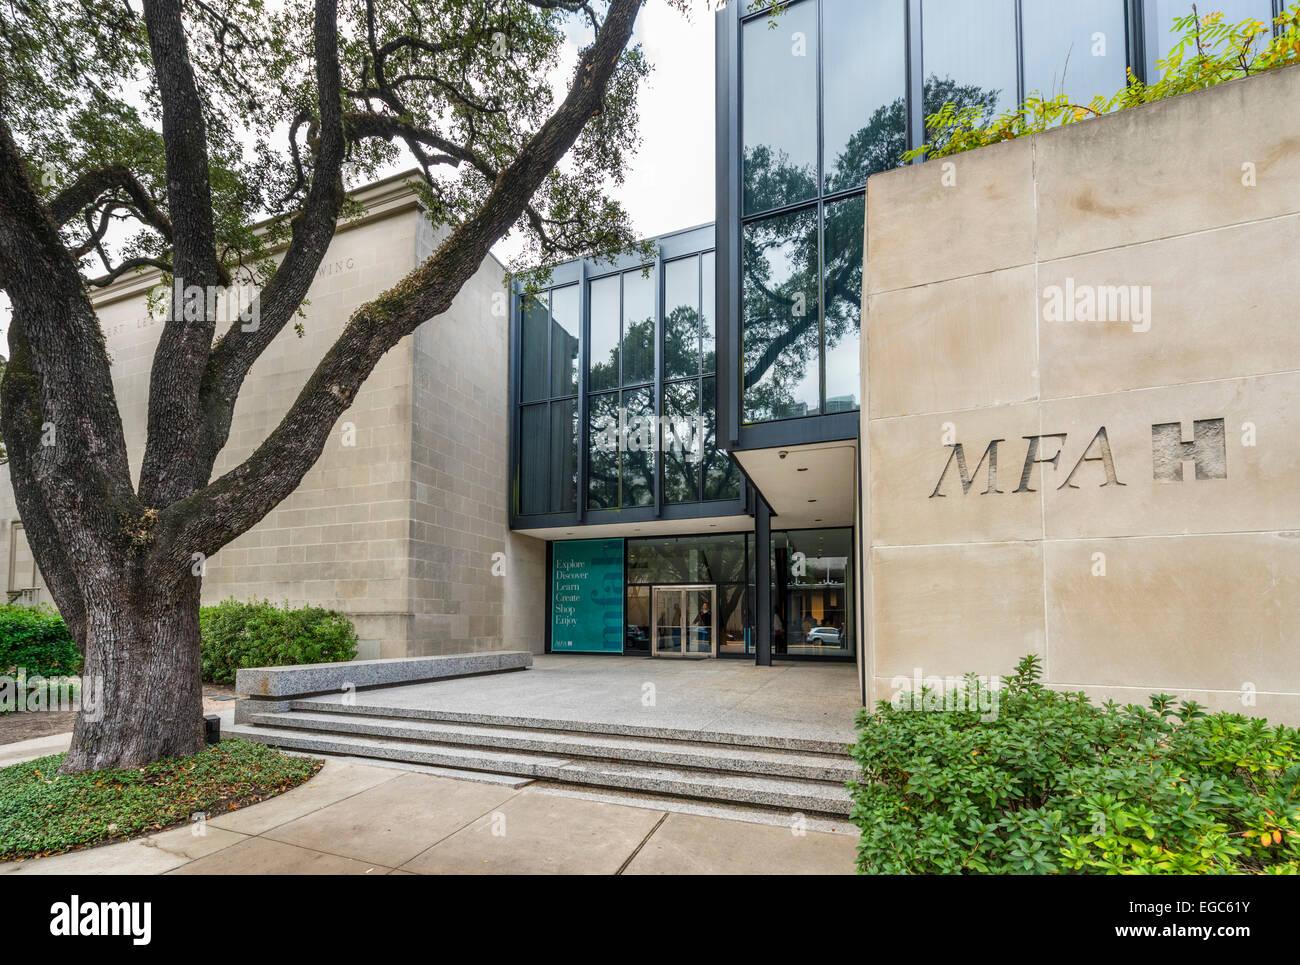 Die Caroline Wiess Law Building im Museum of Fine Arts, Hauptstraße, Museumsviertel, Houston, Texas, USA Stockbild